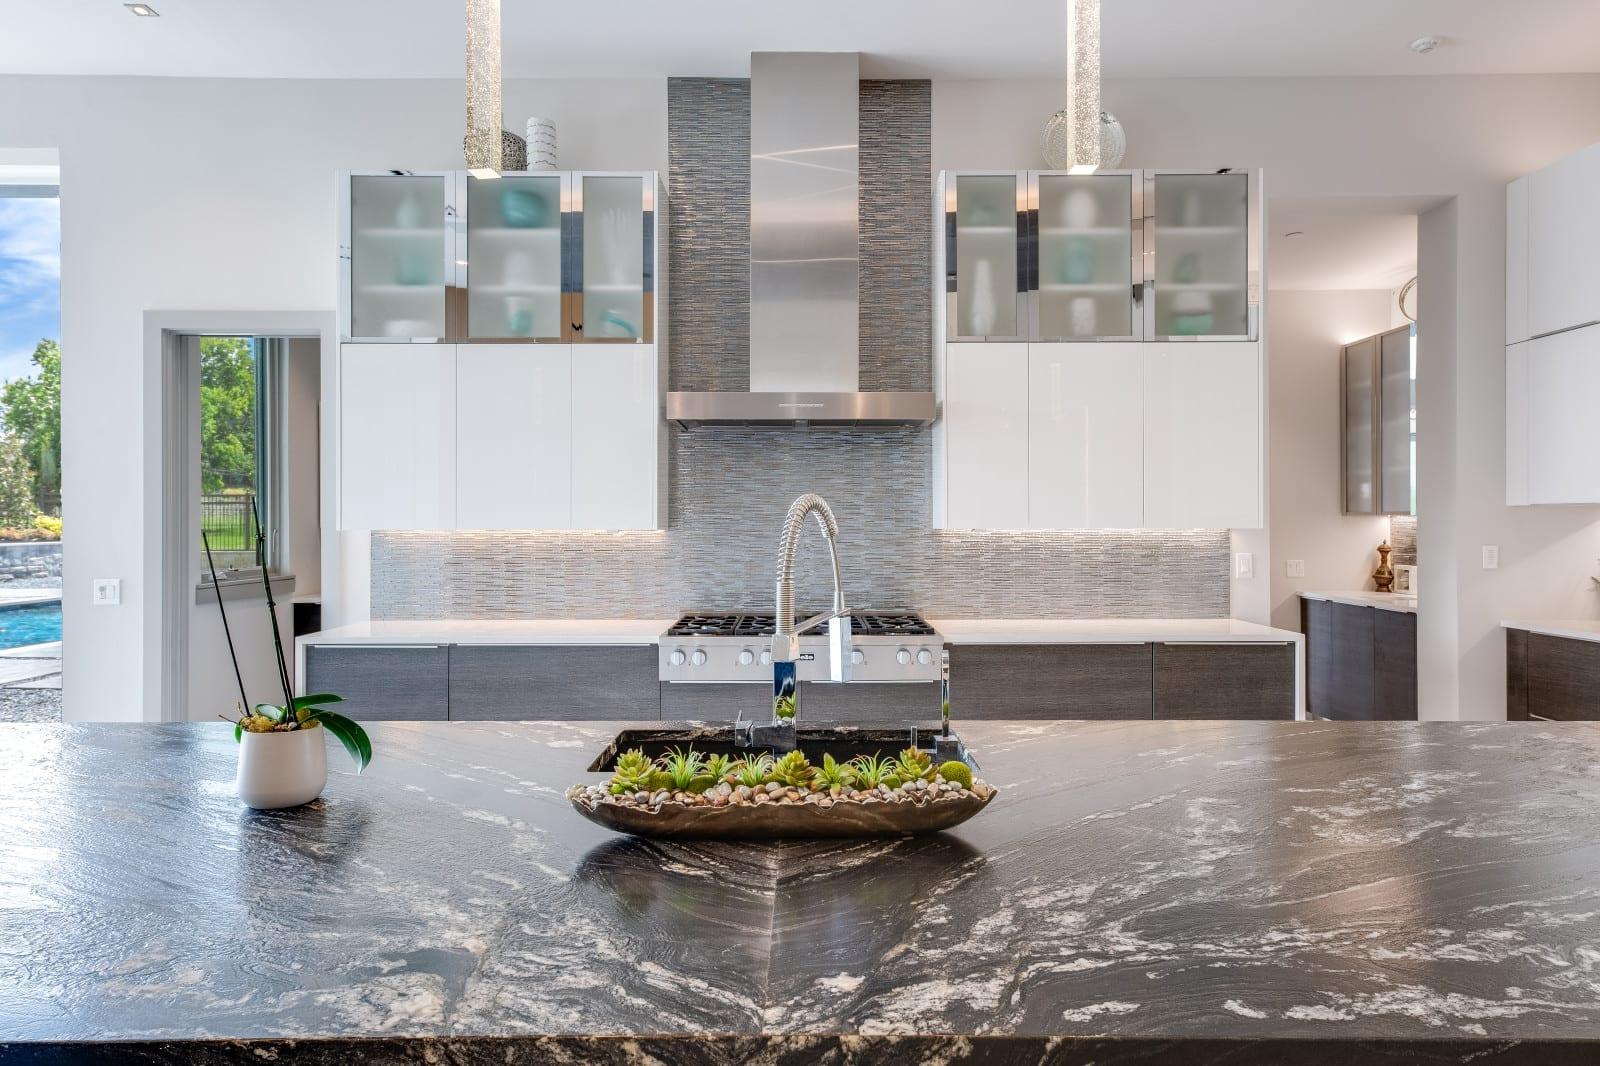 Custom Home Build and Interior Design # 37 - Millennial Design + Build, Home Builders in Dallas Texas, modern style homes, and custom home builders in DFW